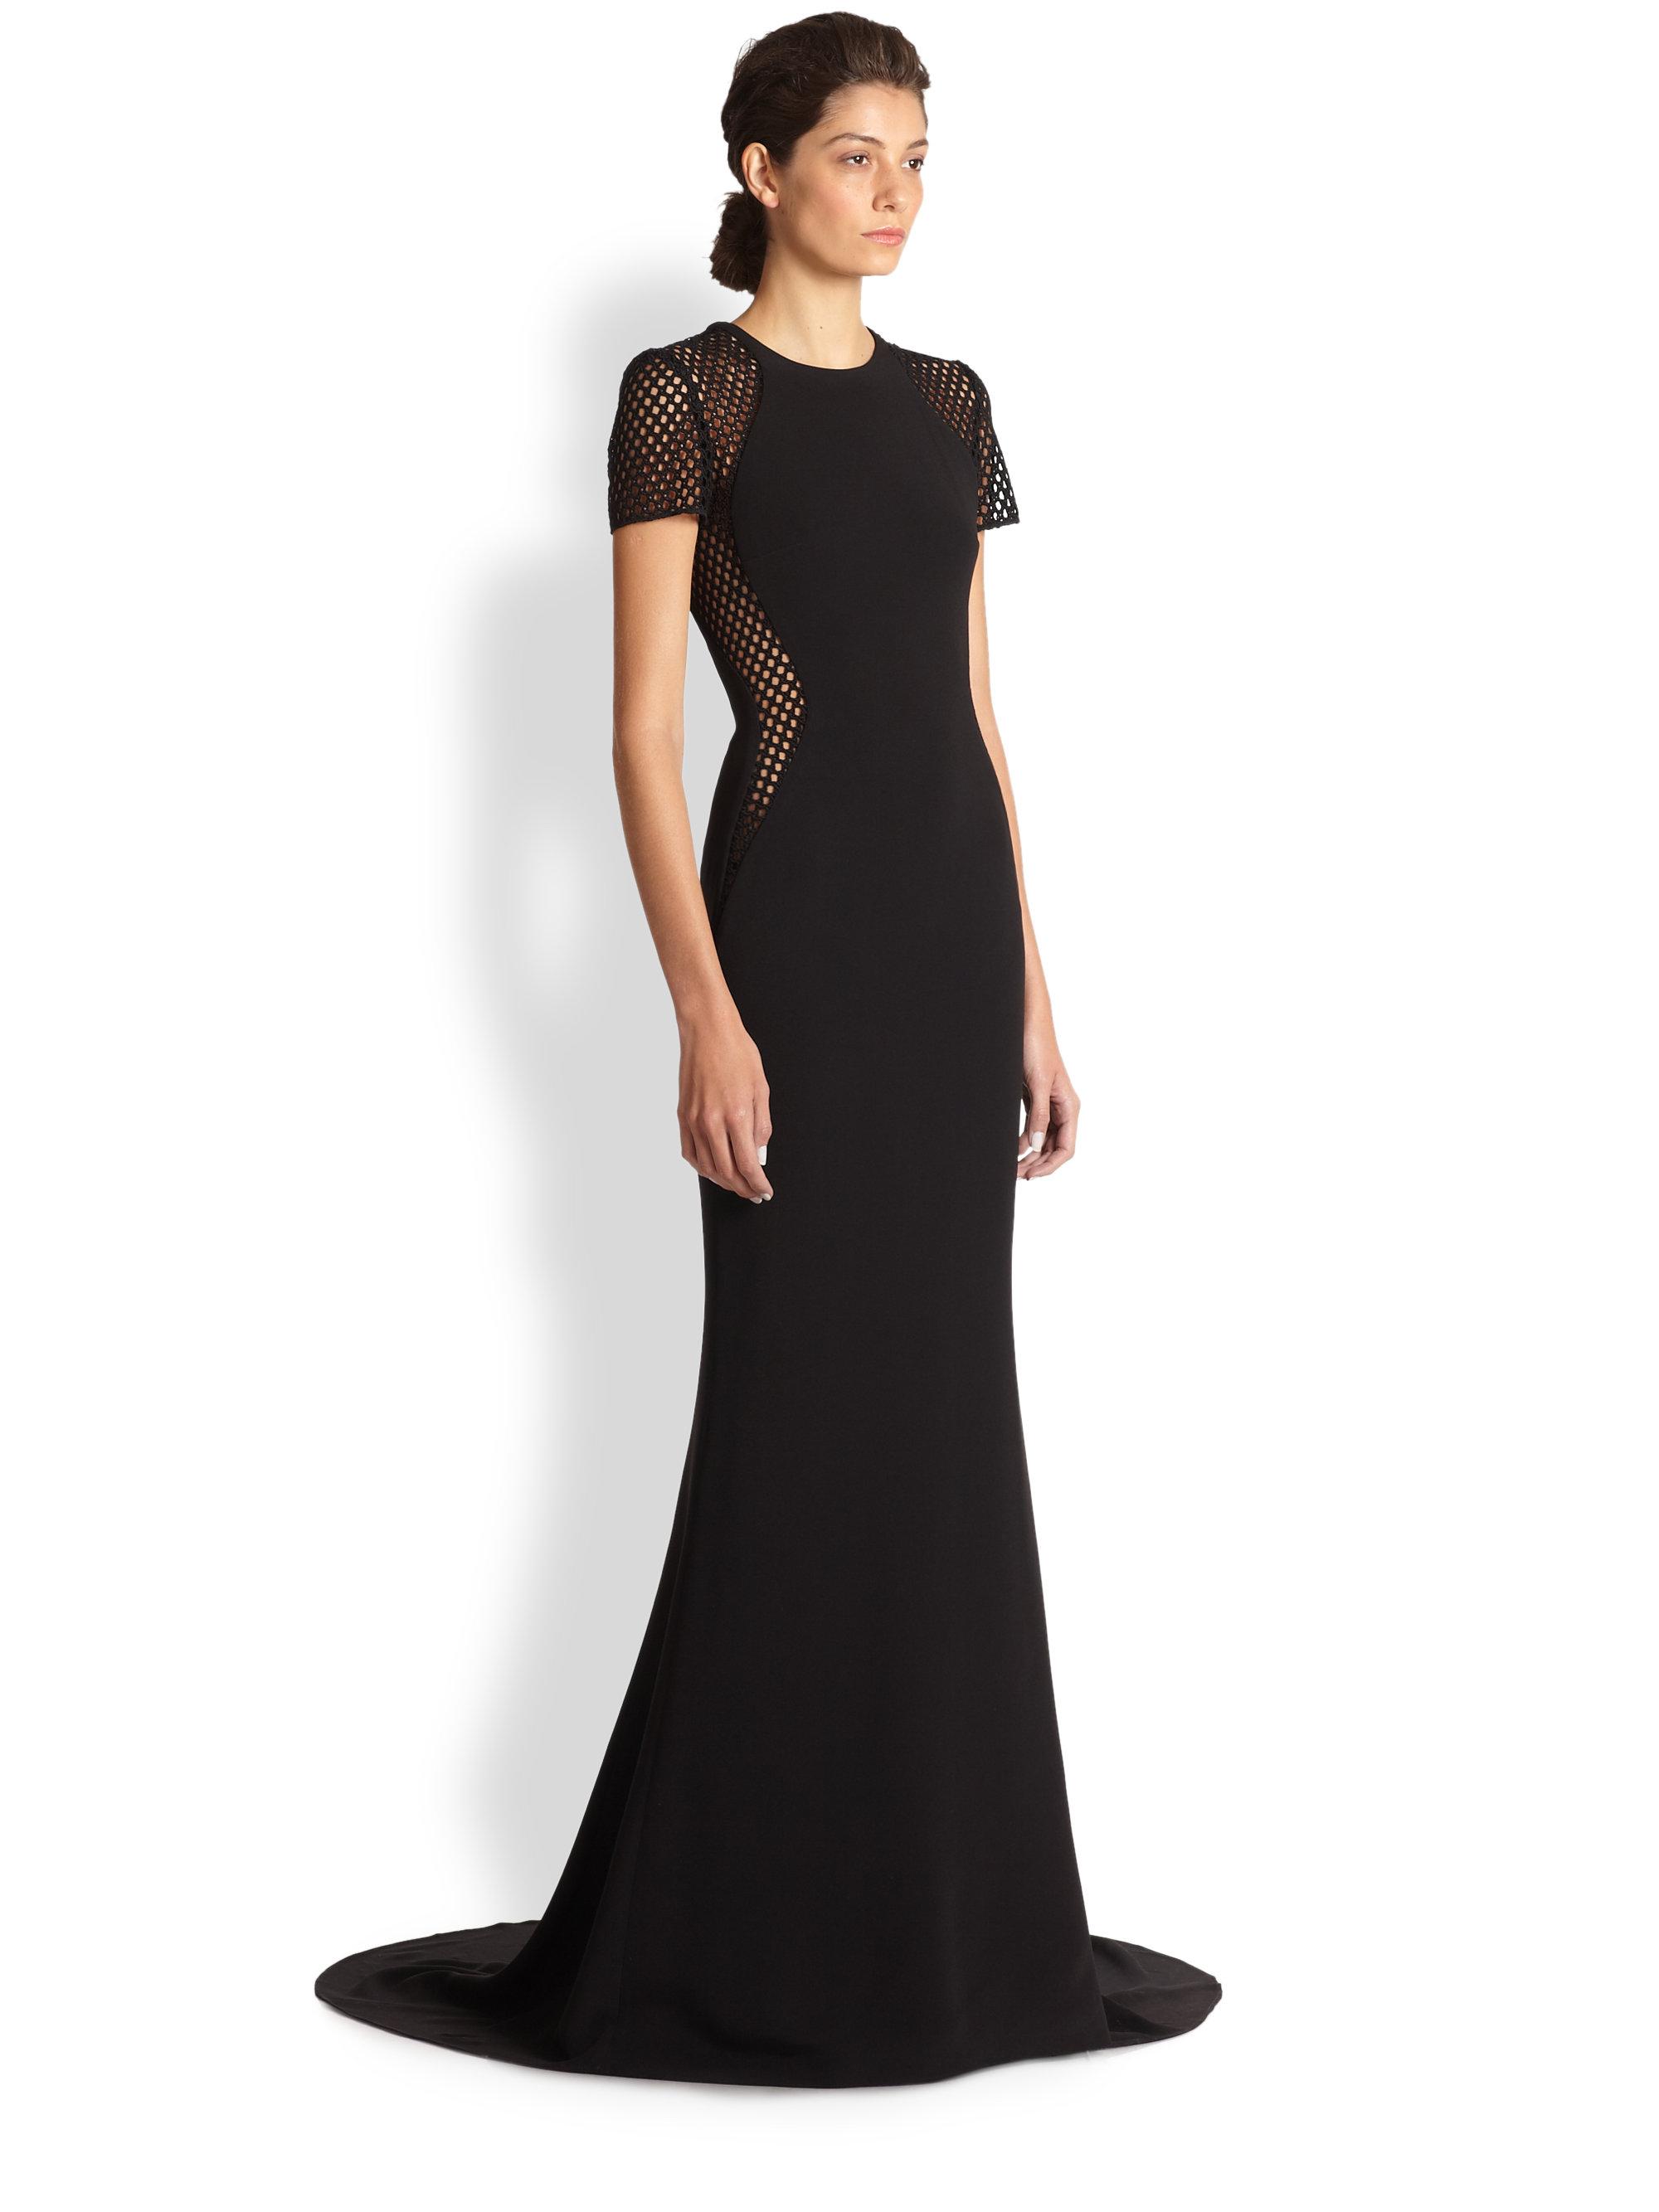 Lyst - Stella Mccartney Belinda Mesh Insert Gown in Black